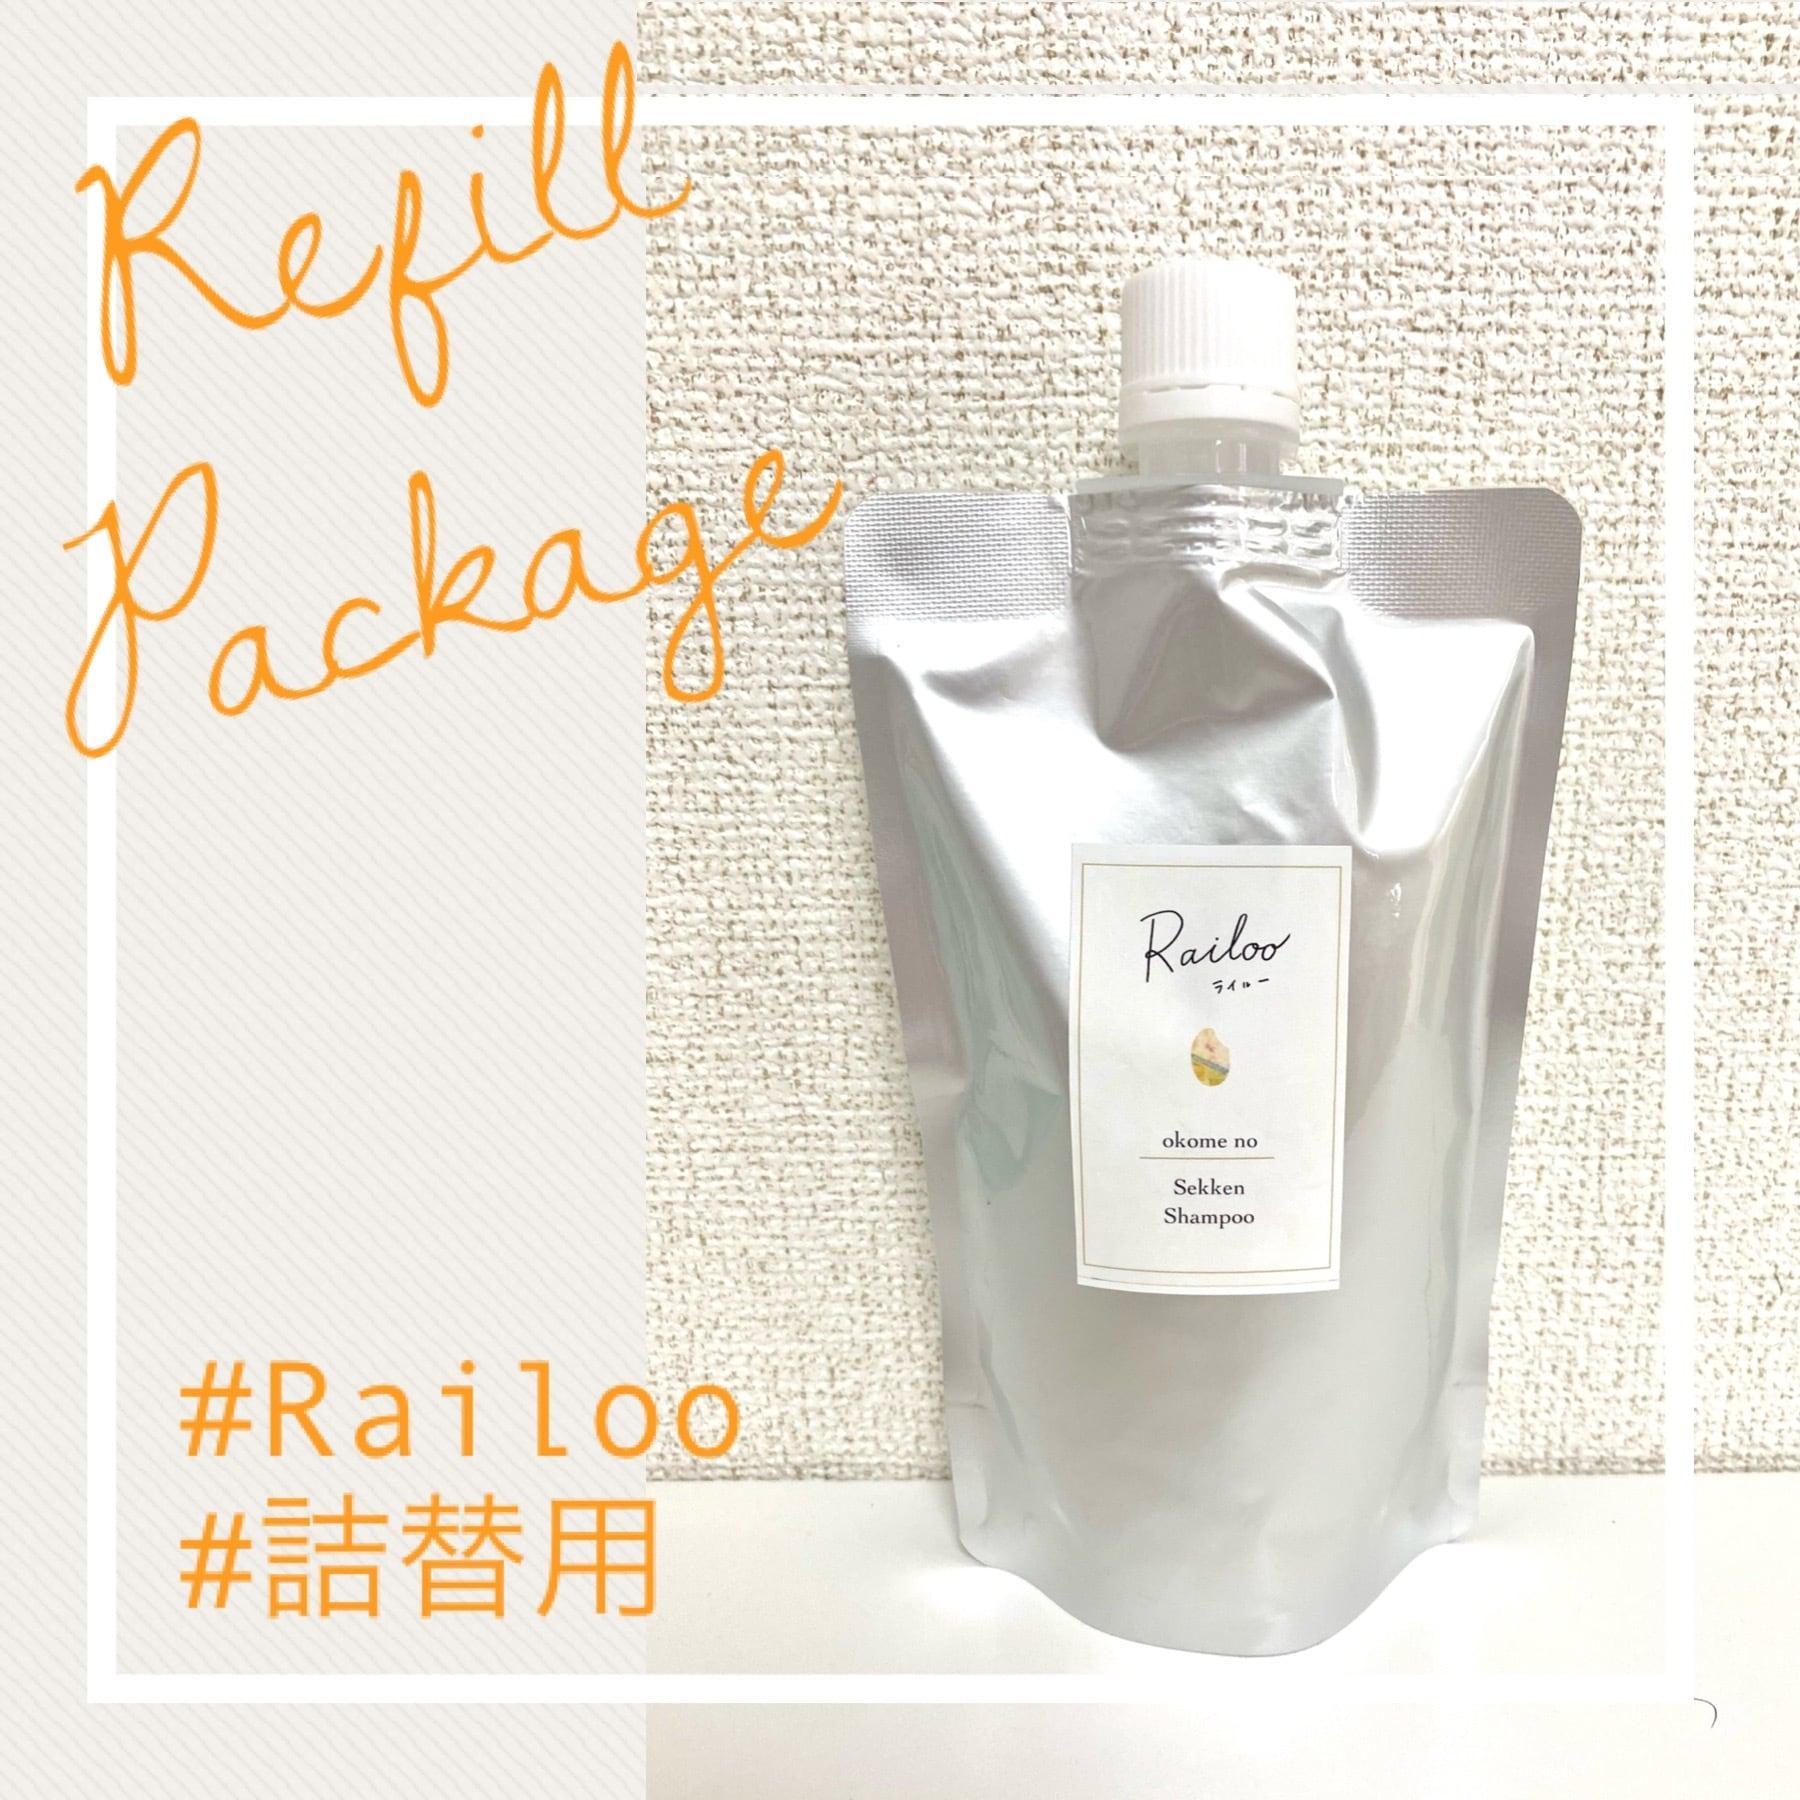 Railooアンバサダー限定◇詰替用◇ライルーお米の石けんシャンプー◇300mL